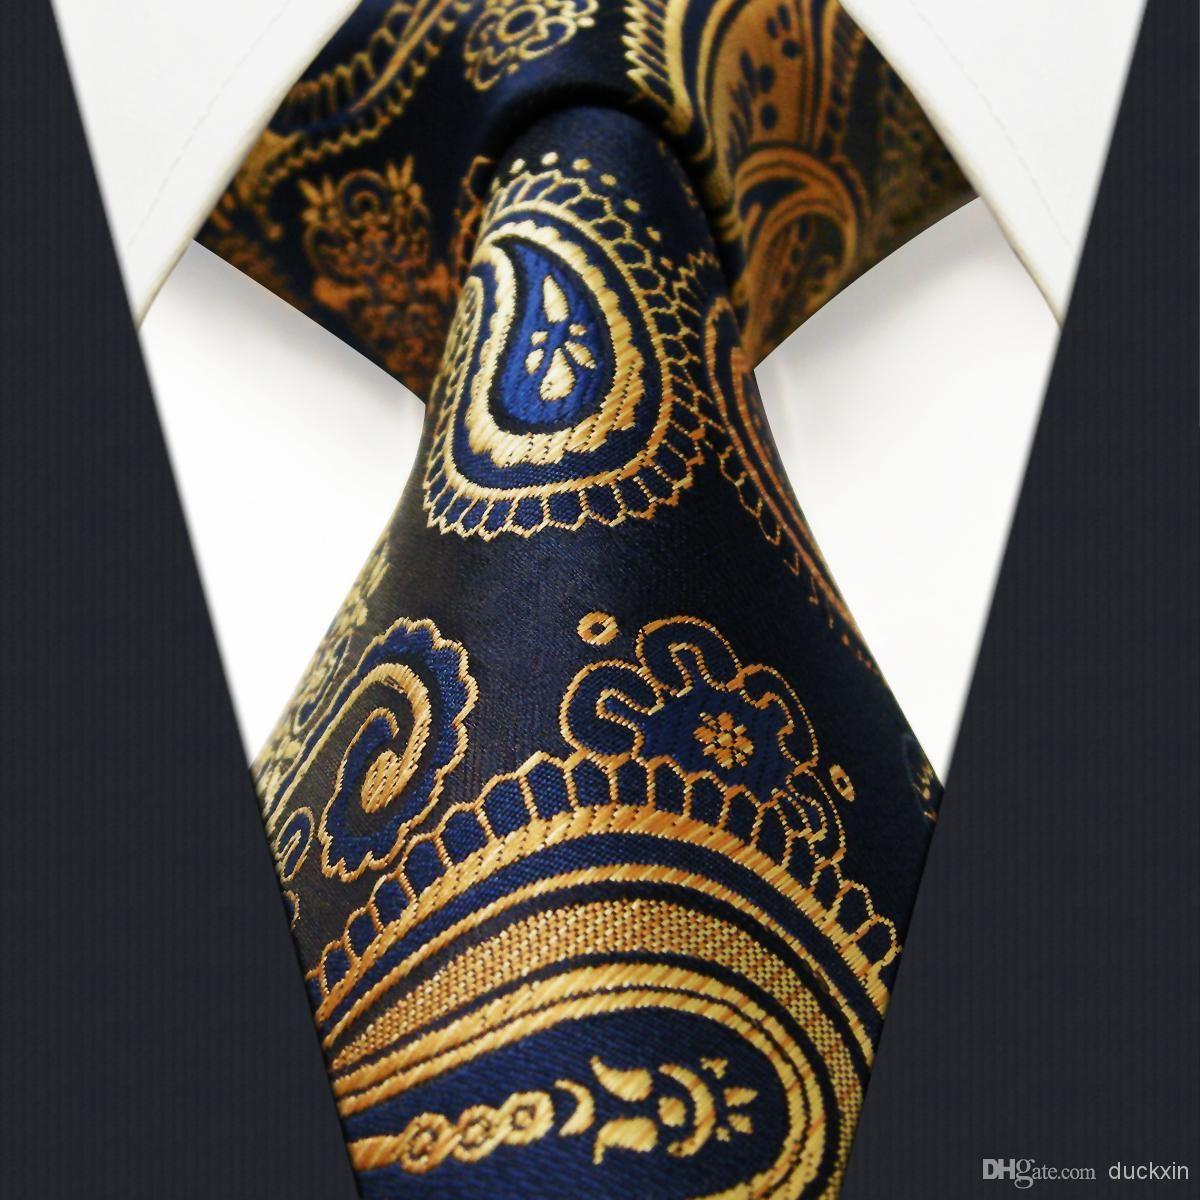 85ab72828012 U10 Multi Color Gold Blue Navy Paisley Mens Tie Neckties Jacquarhsia Dark  Gray Grey Mens Ties 100% Silk Jacquard Woven Bow Ties Cravat From Duckxin,  ...